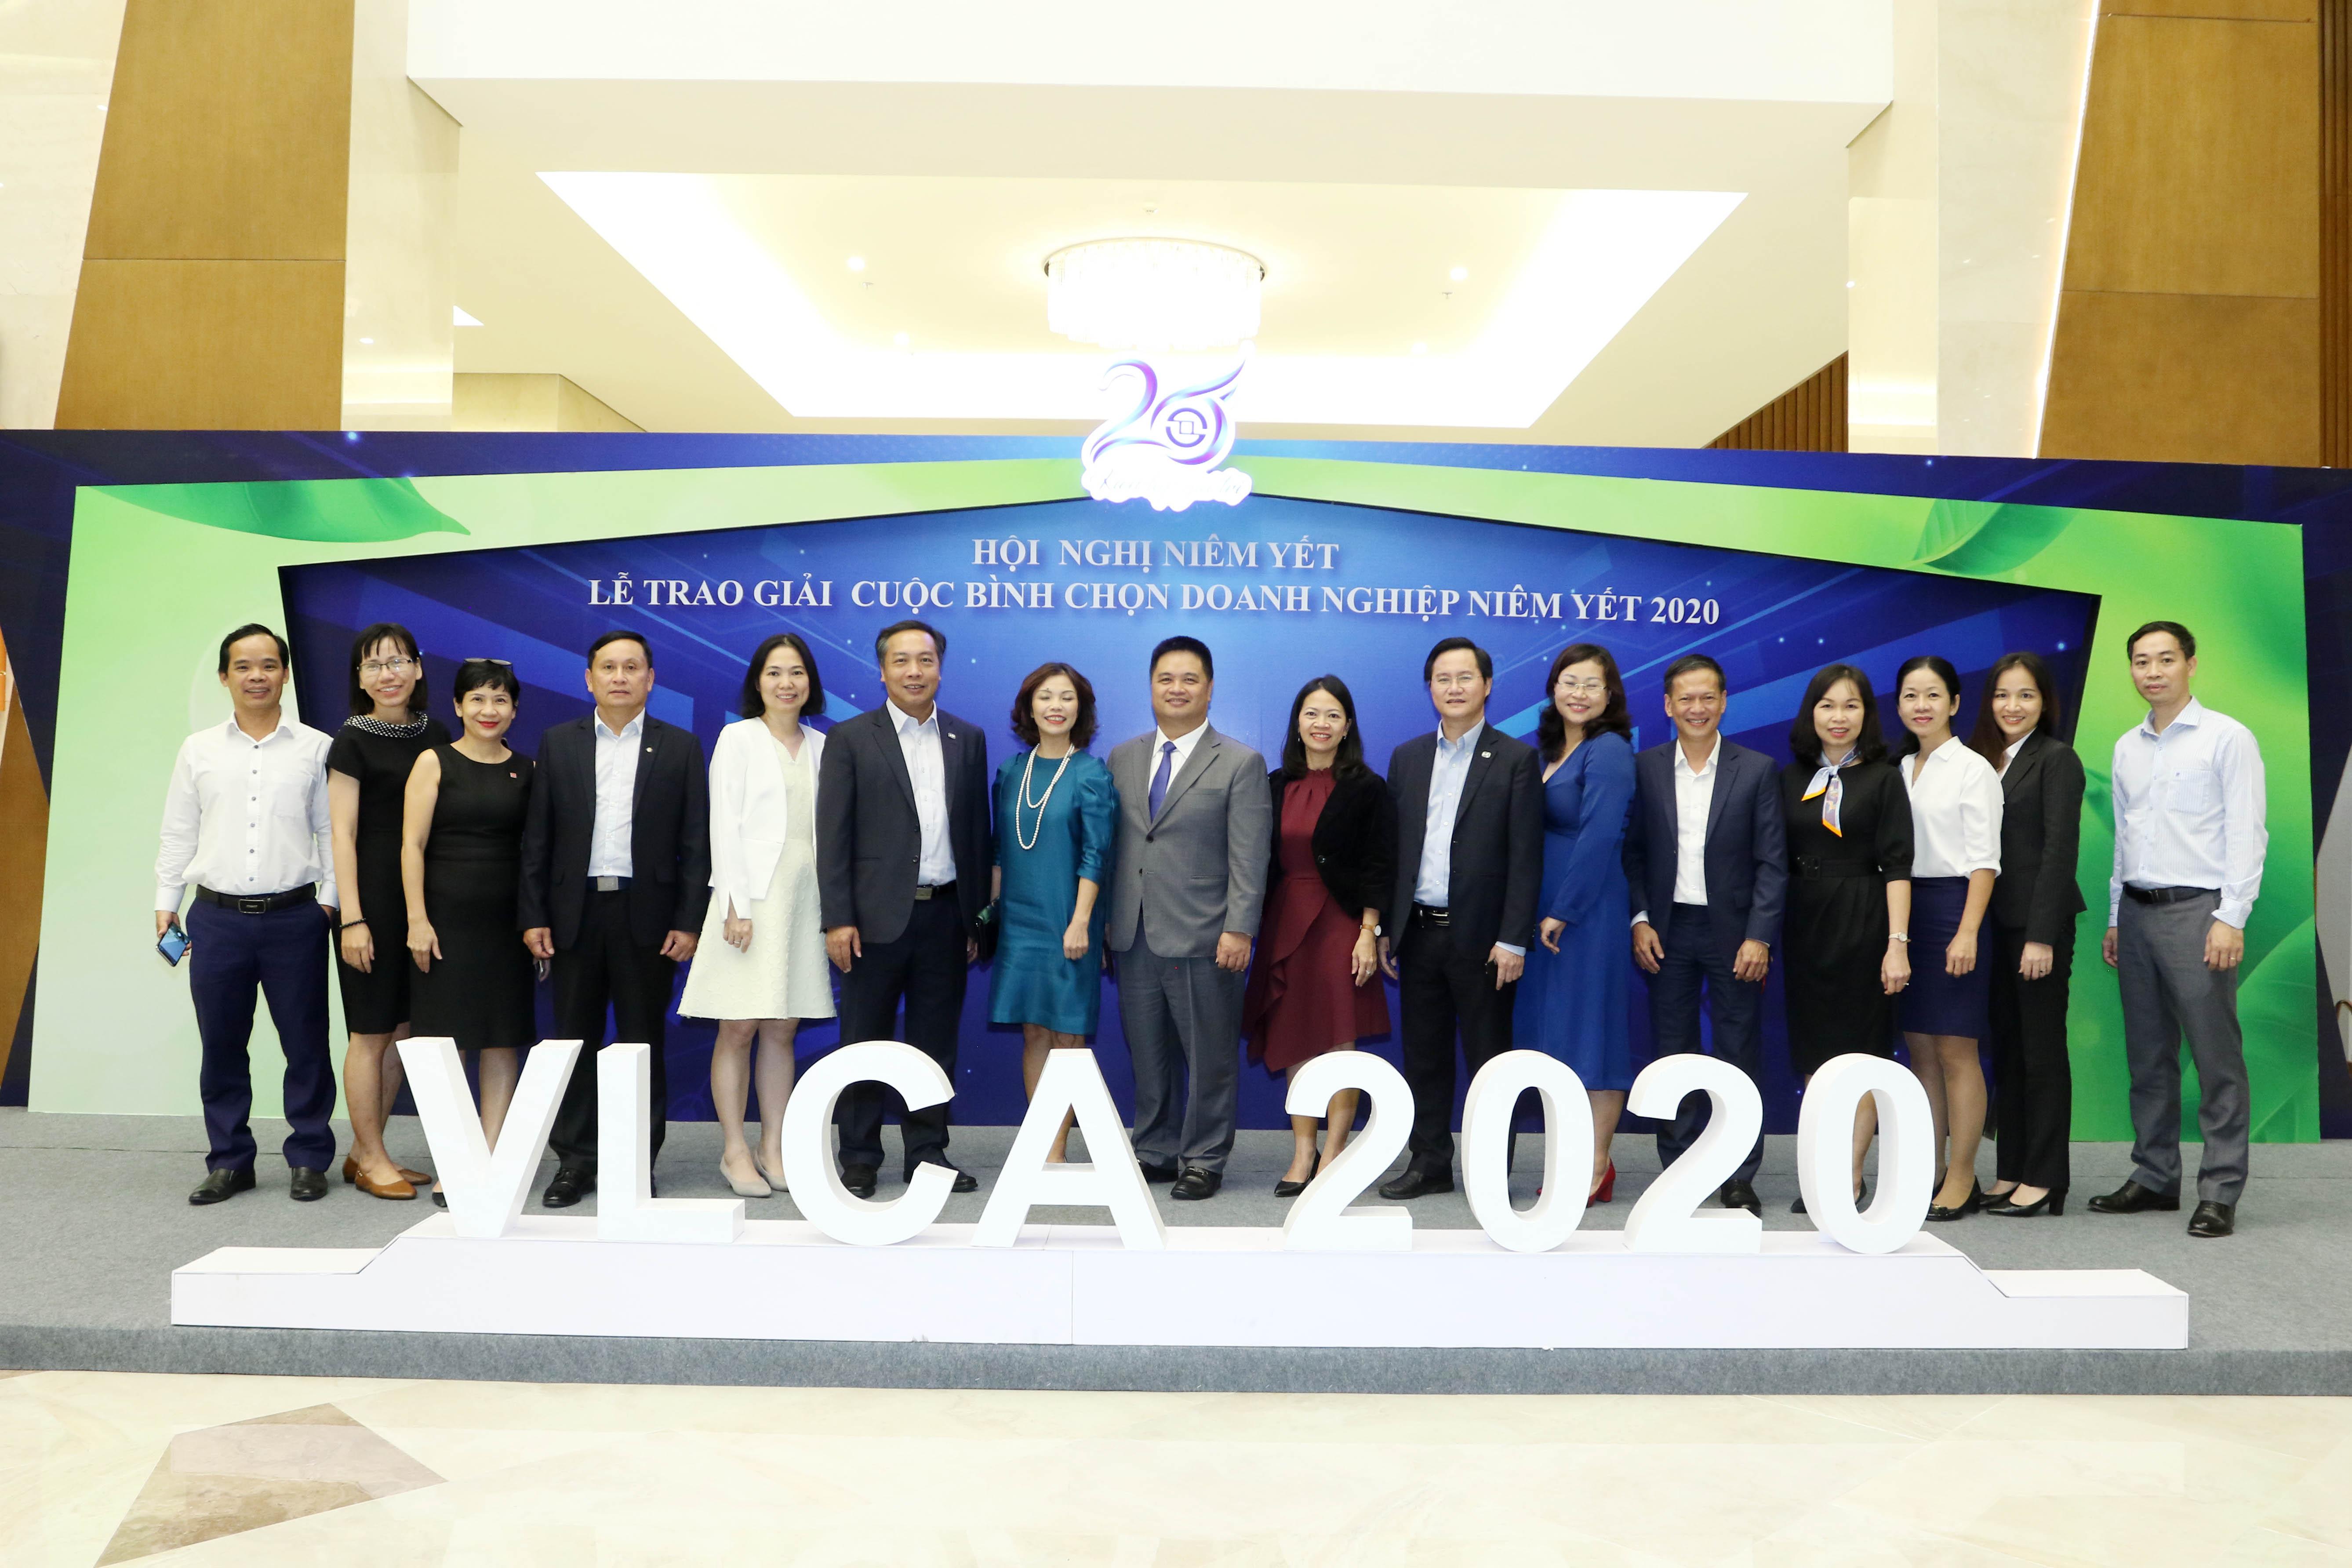 https://www.aravietnam.vn/wp-content/uploads/2020/12/2F0A9419.jpg